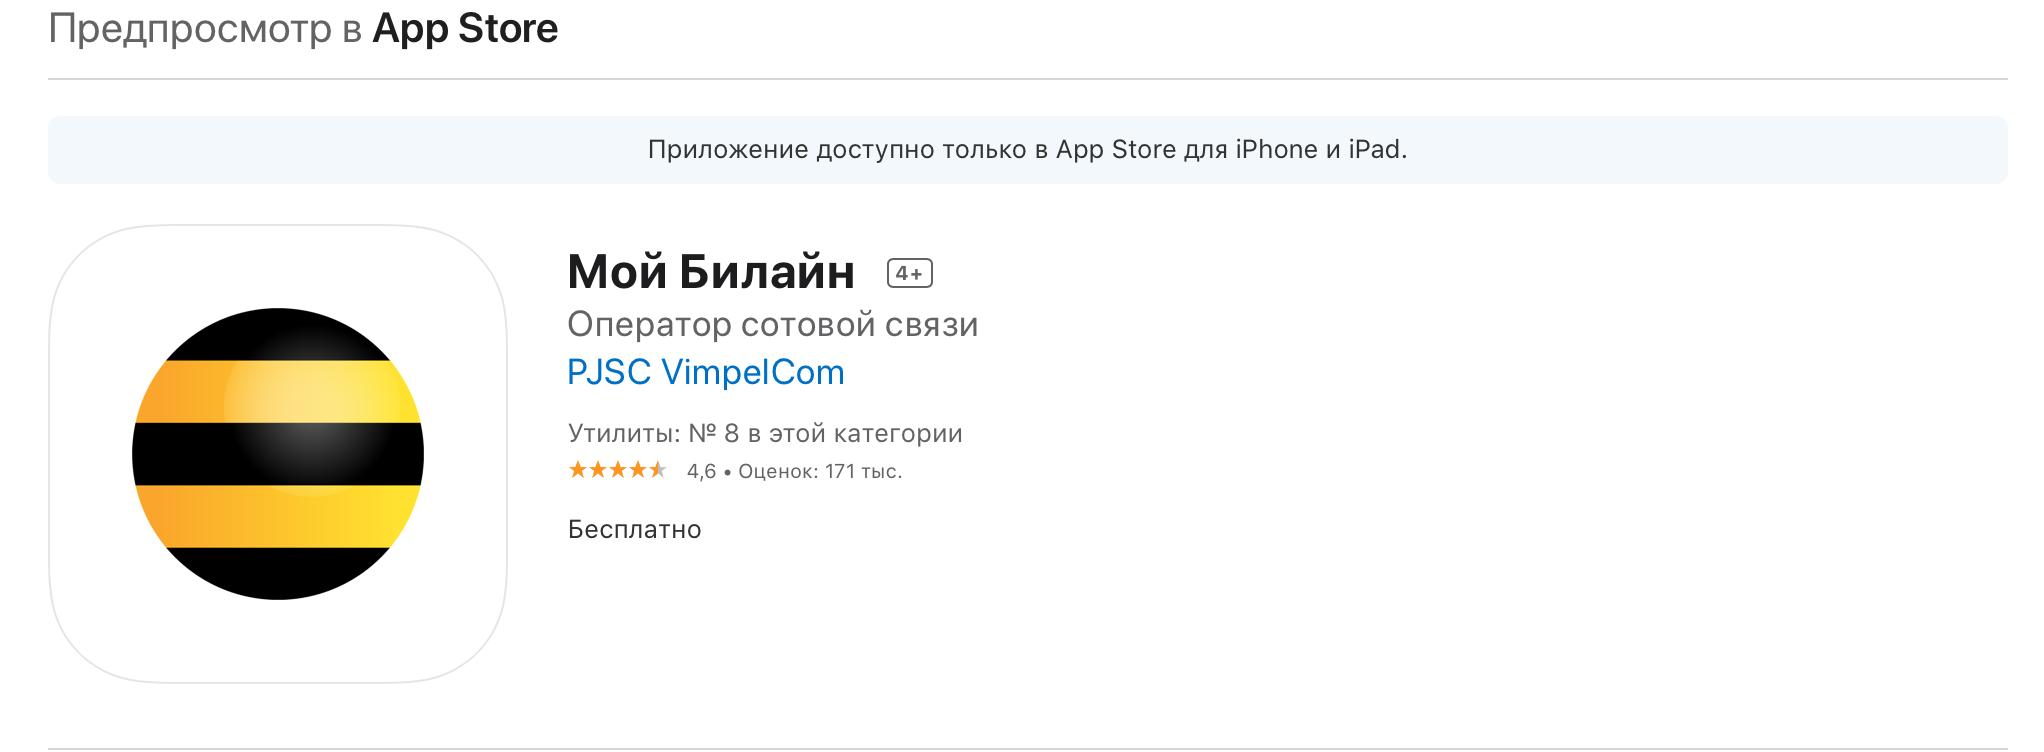 moi beeline App Store